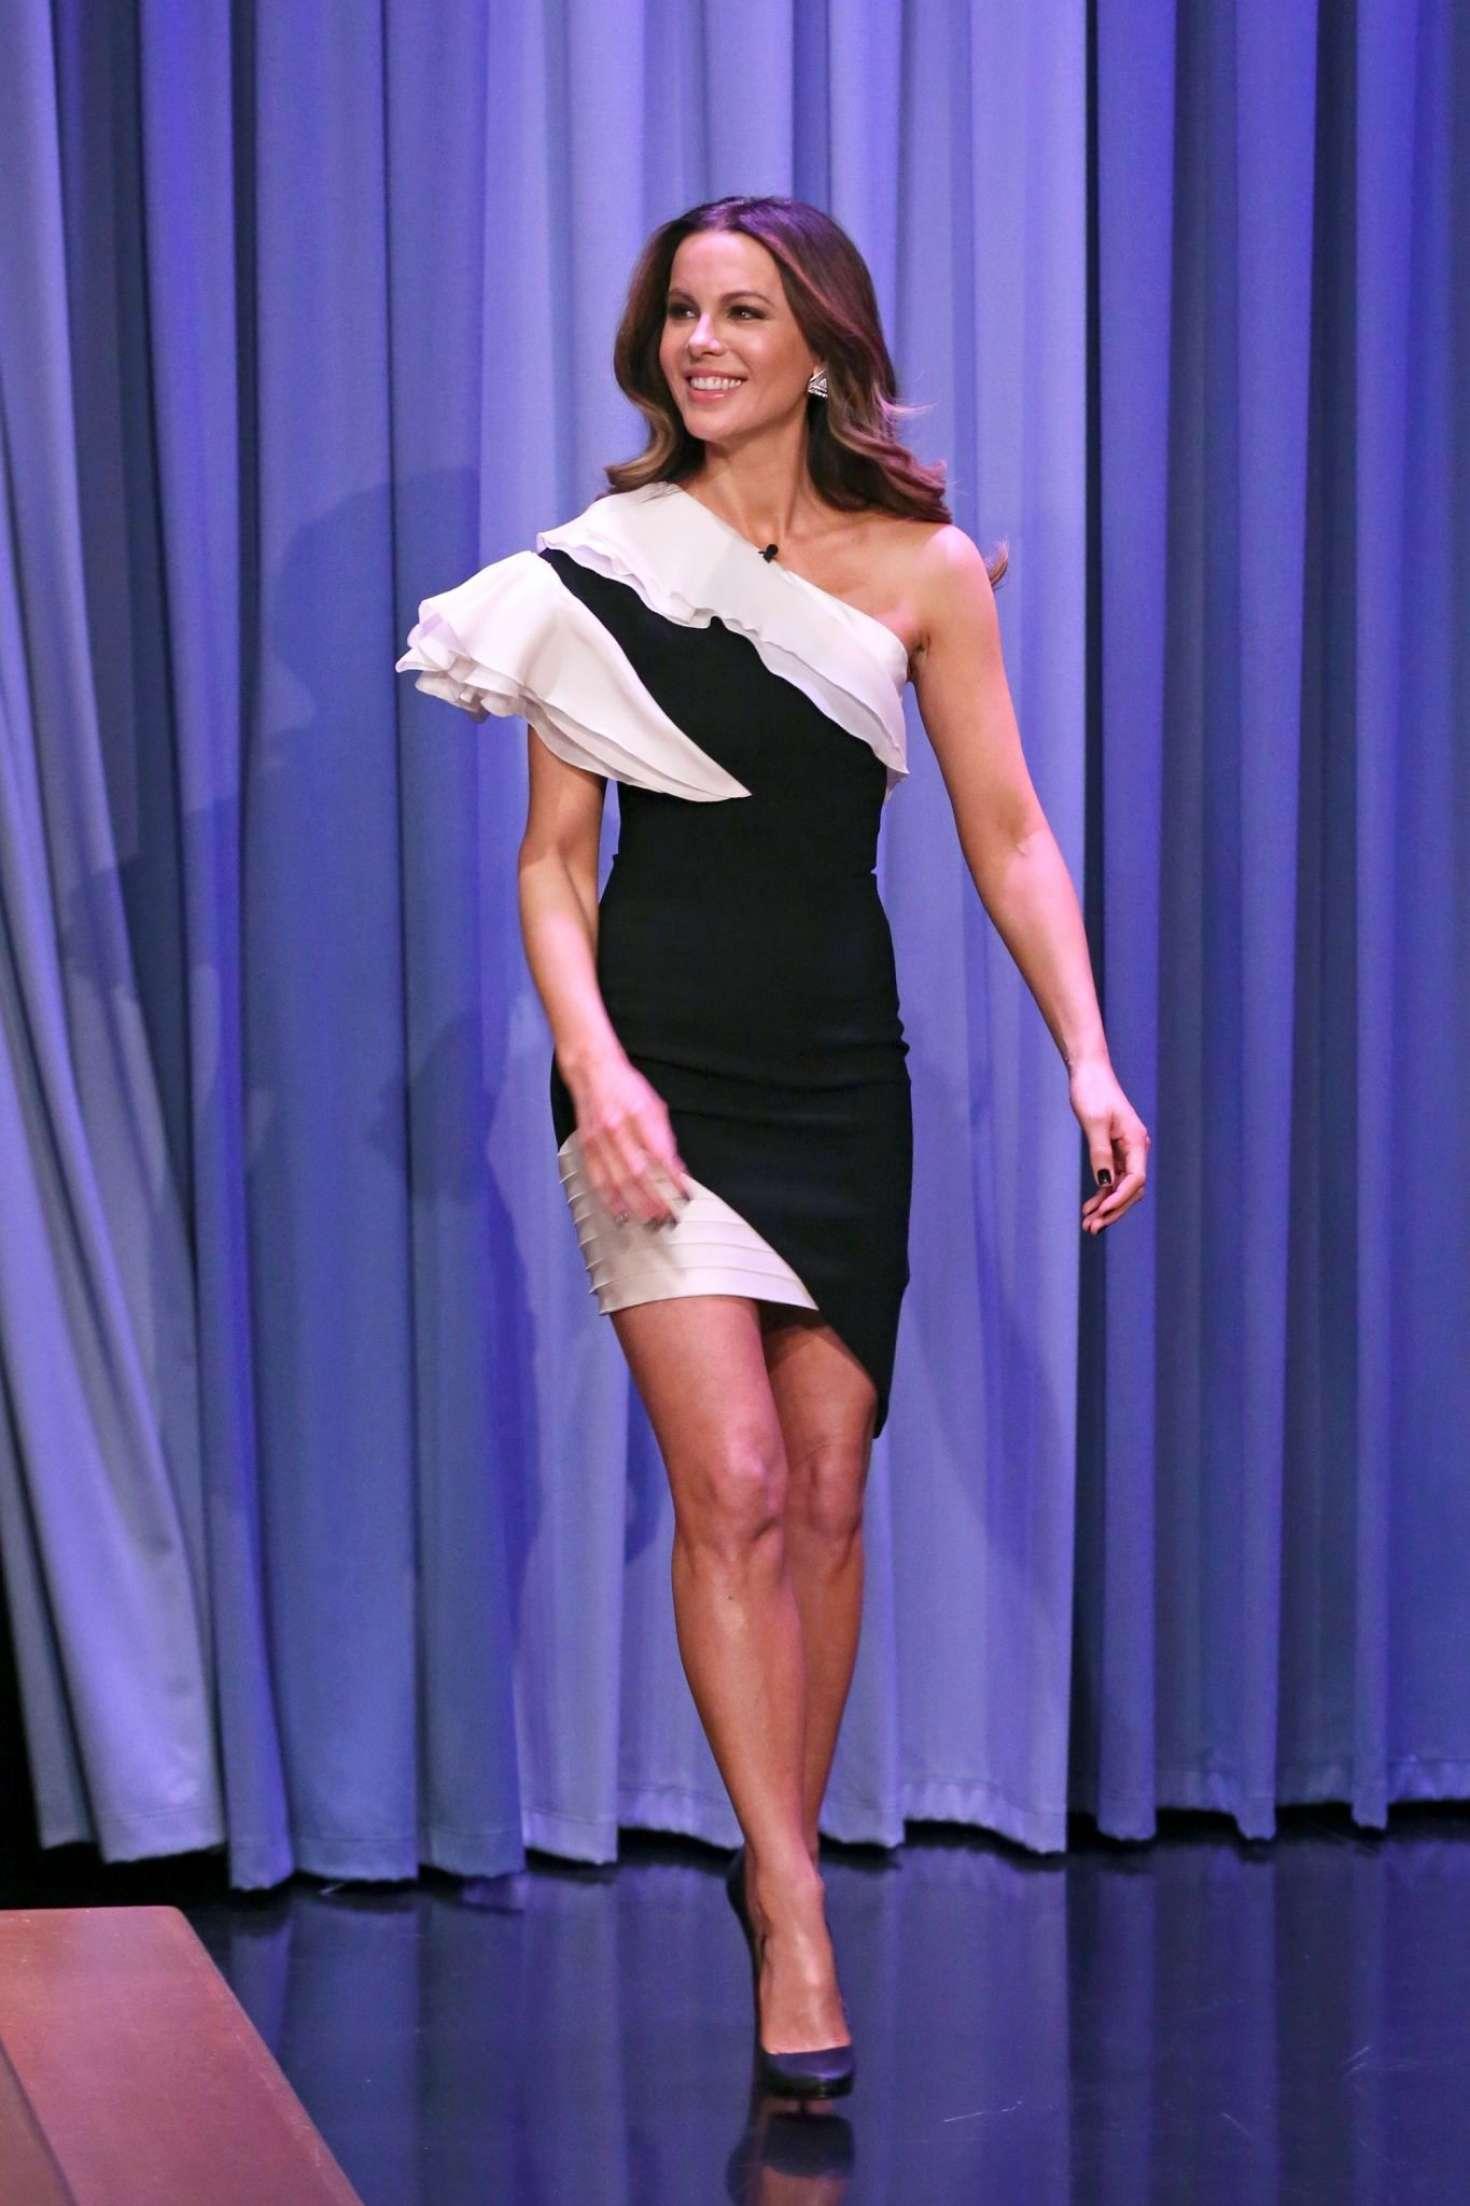 Kate Beckinsale 2019 : Kate Beckinsale: On The Tonight Show Starring Jimmy Fallon -02